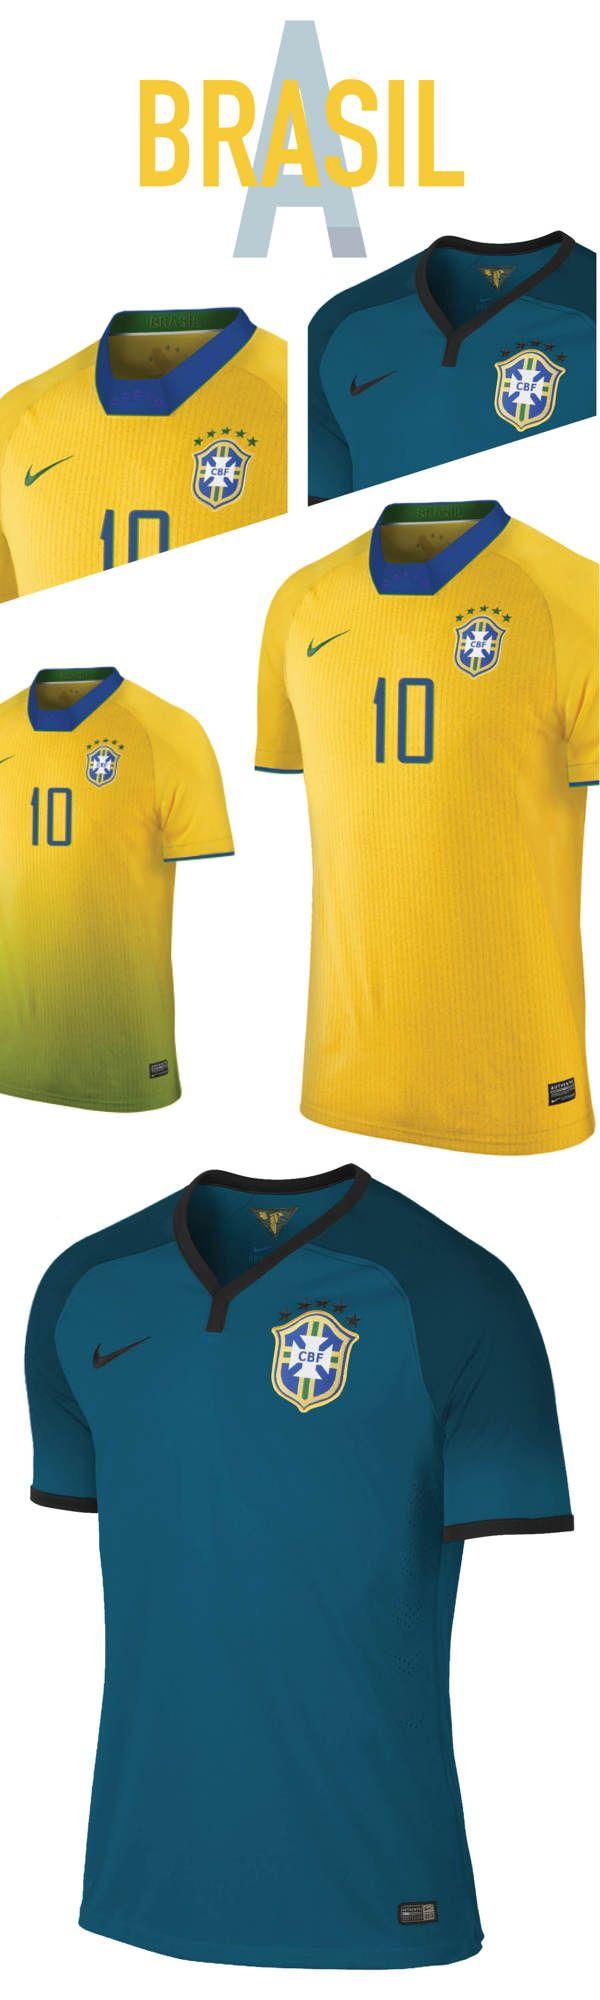 Nerea Palacios Brasil. World Cup. Group A. Concepts on Behance